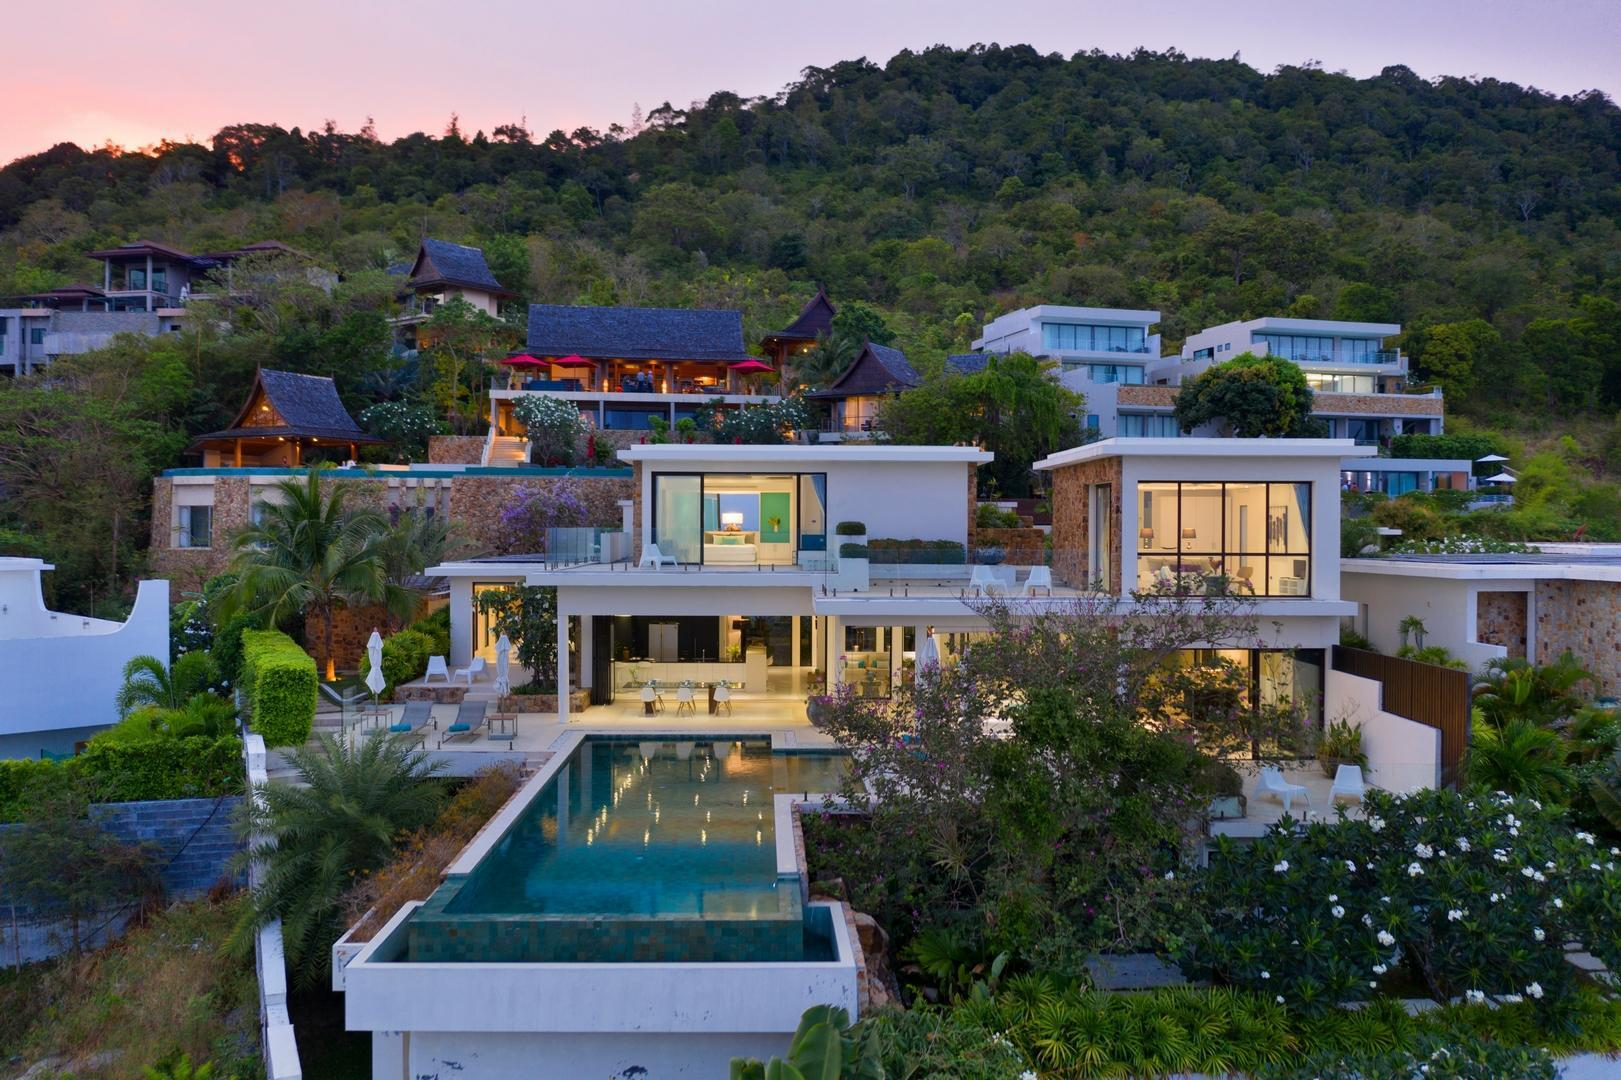 Villa Turquoise- Chaweng 7 Bedrooms With Seaview วิลลา 7 ห้องนอน 7 ห้องน้ำส่วนตัว ขนาด 1500 ตร.ม. – เชิงมน